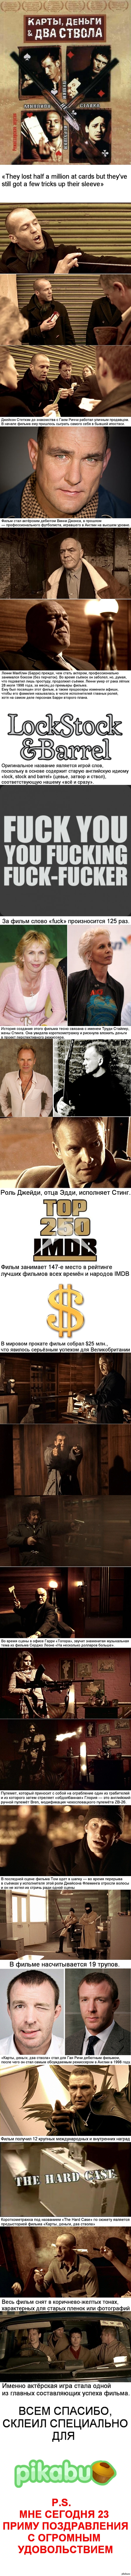 http://s.pikabu.ru/post_img/2013/03/20/6/1363768851_1365044214.jpg